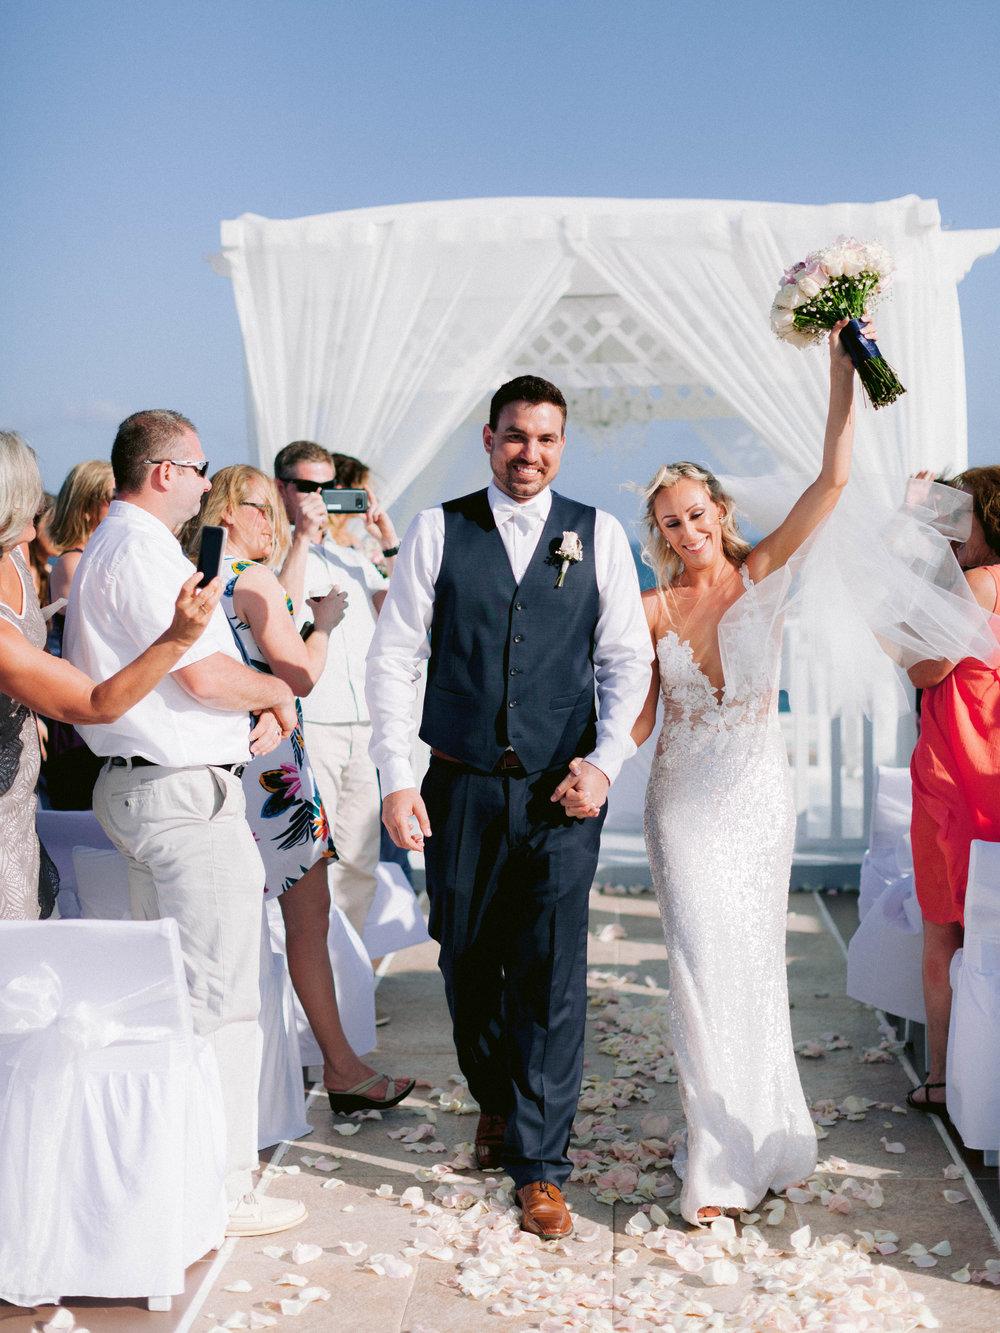 Kim_Jeff_Cancun Wedding_Ceremony_Kurtz_Orpia (102 of 119).jpg